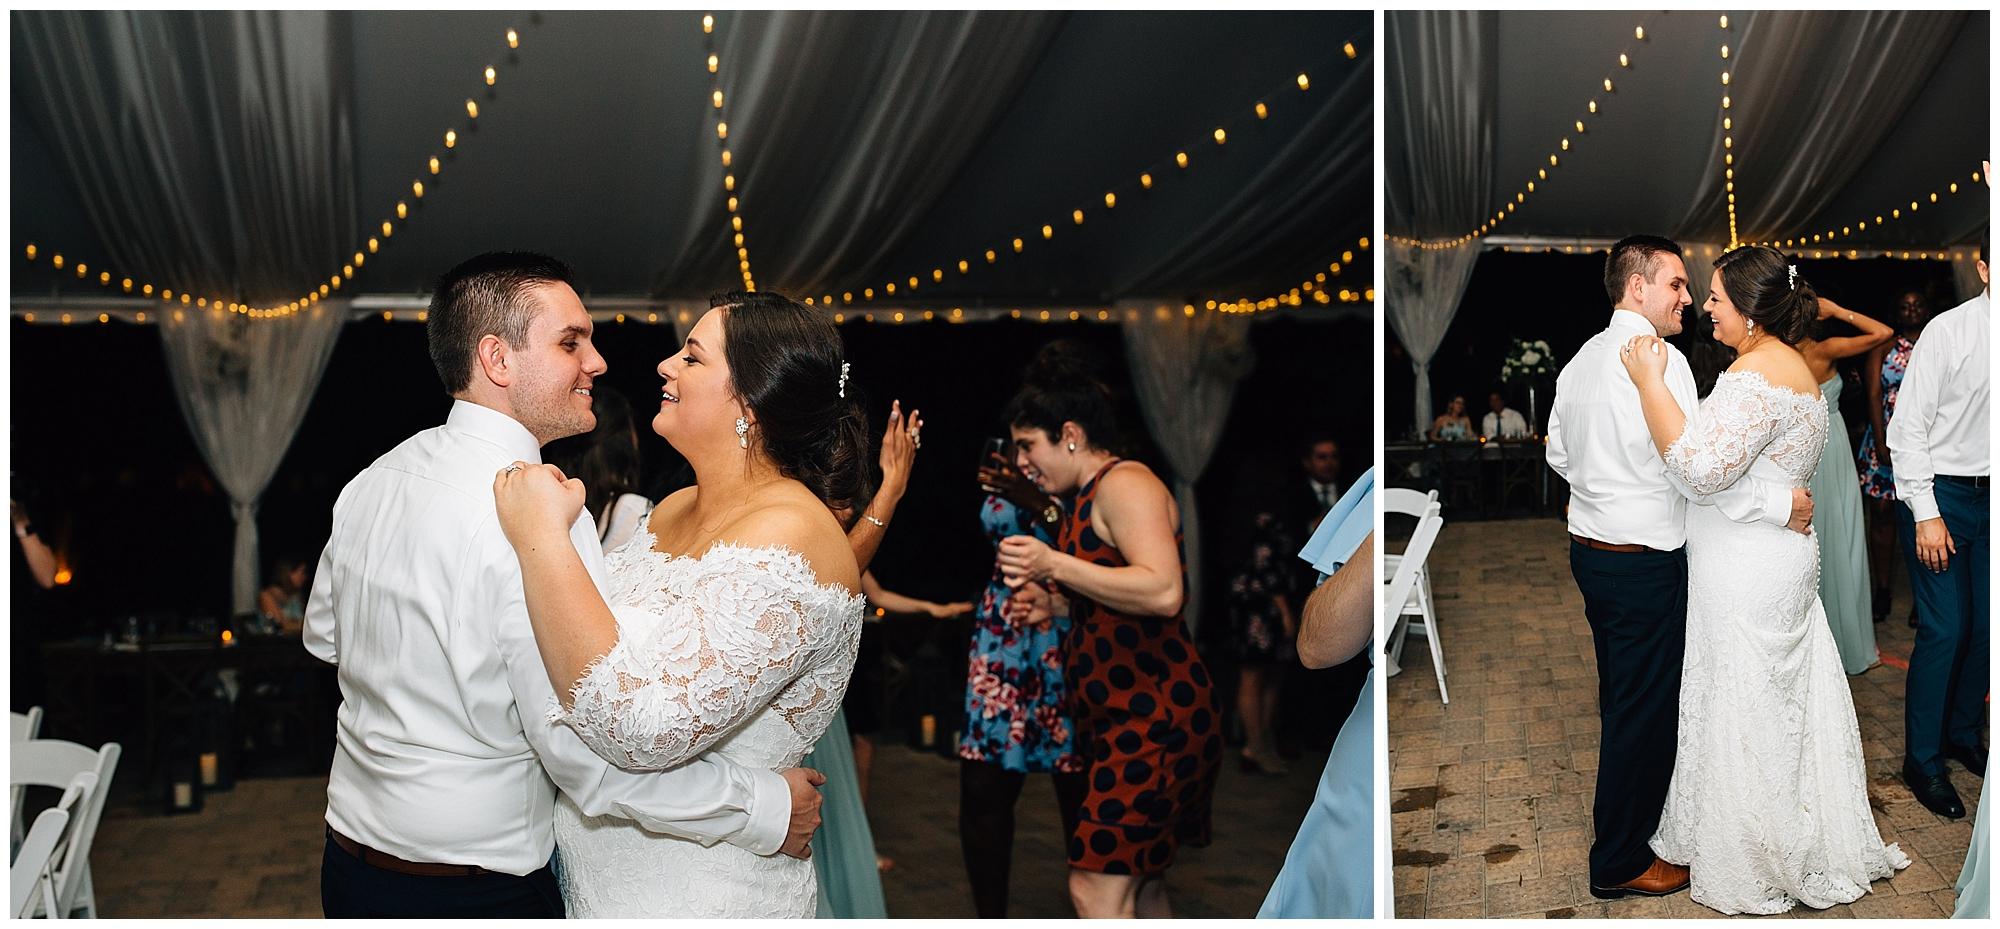 Oaks-at-salem-wedding-apex-photography-114.jpg